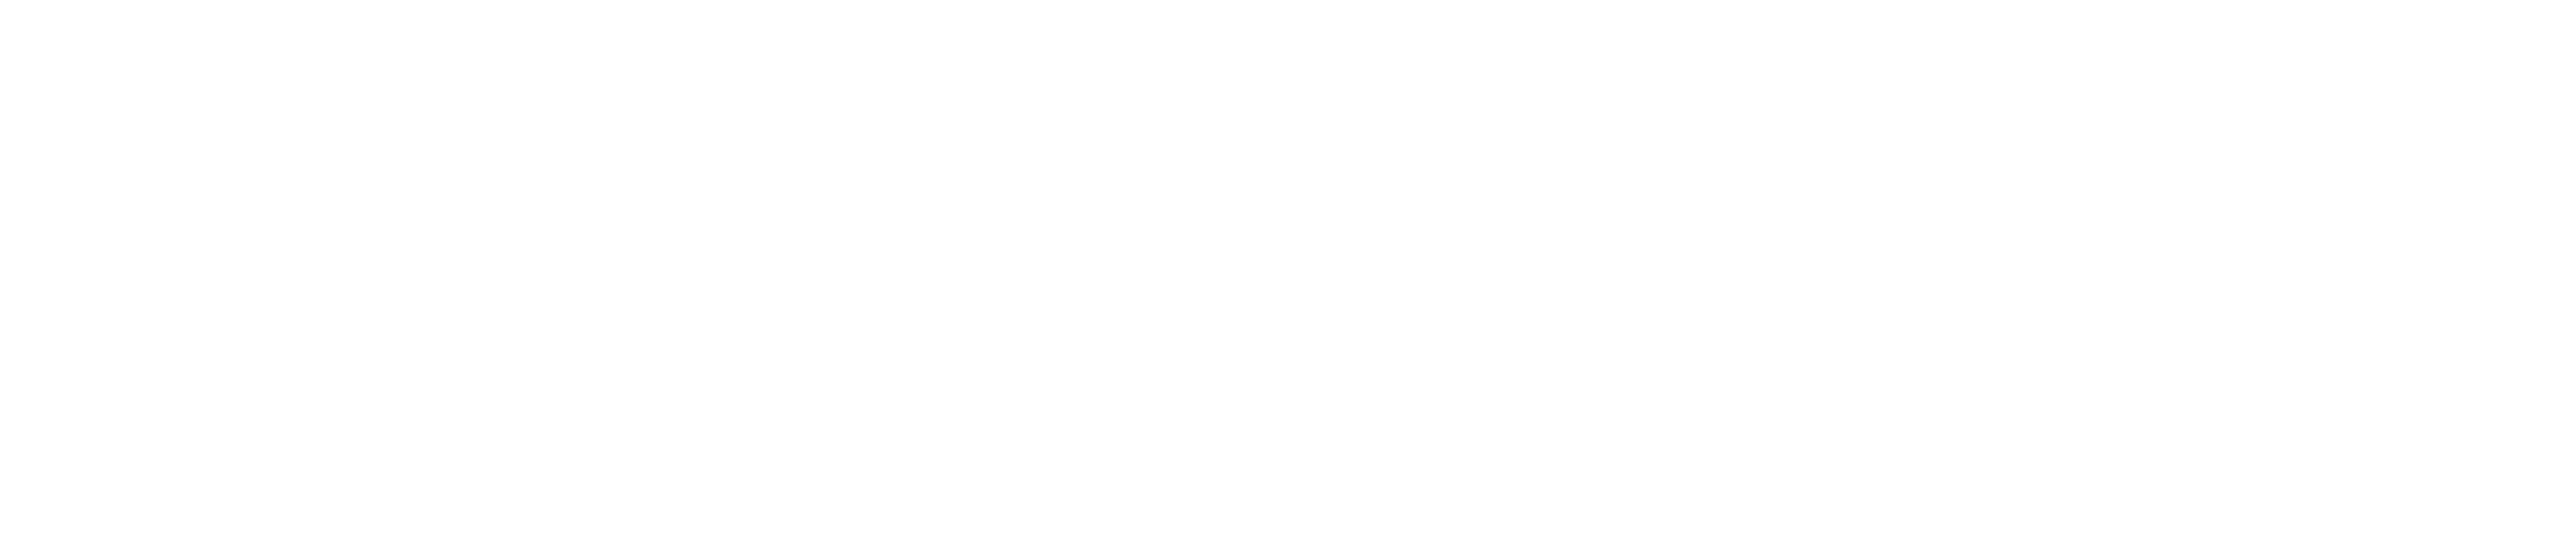 Codapay Online Payment For Digital Content